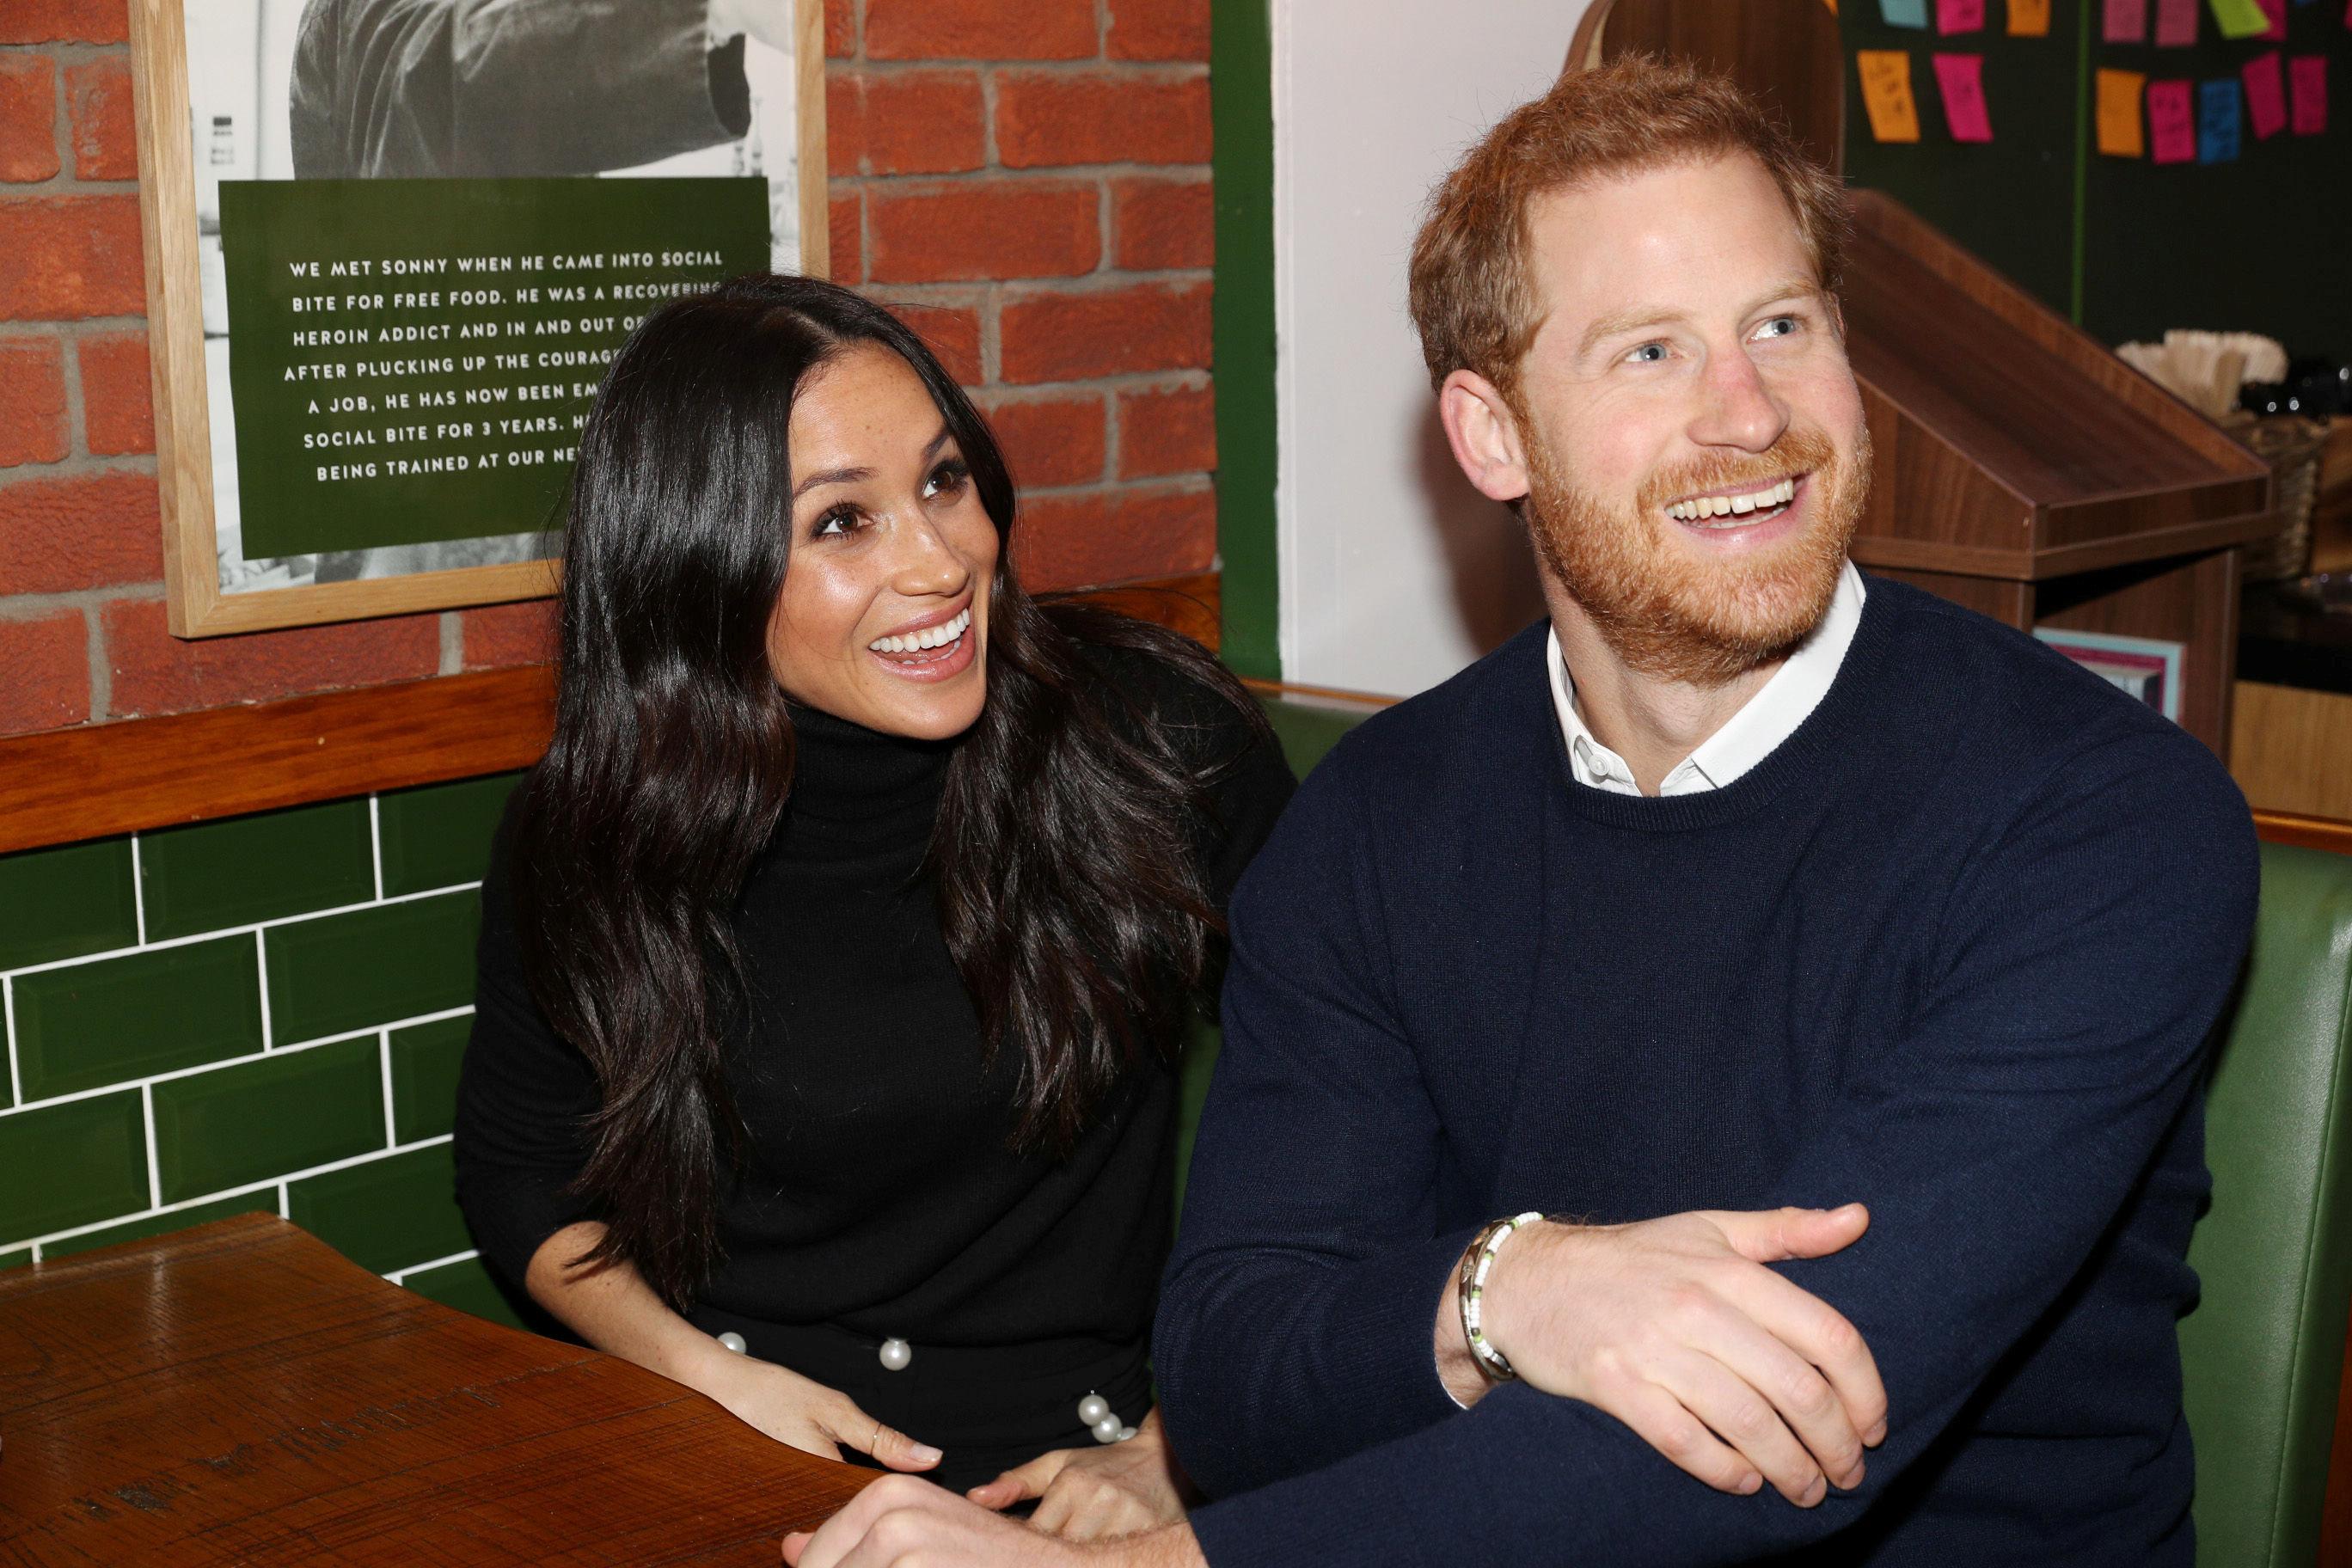 Meghan Markle and Prince Harry in Edinburgh on Feb. 13.